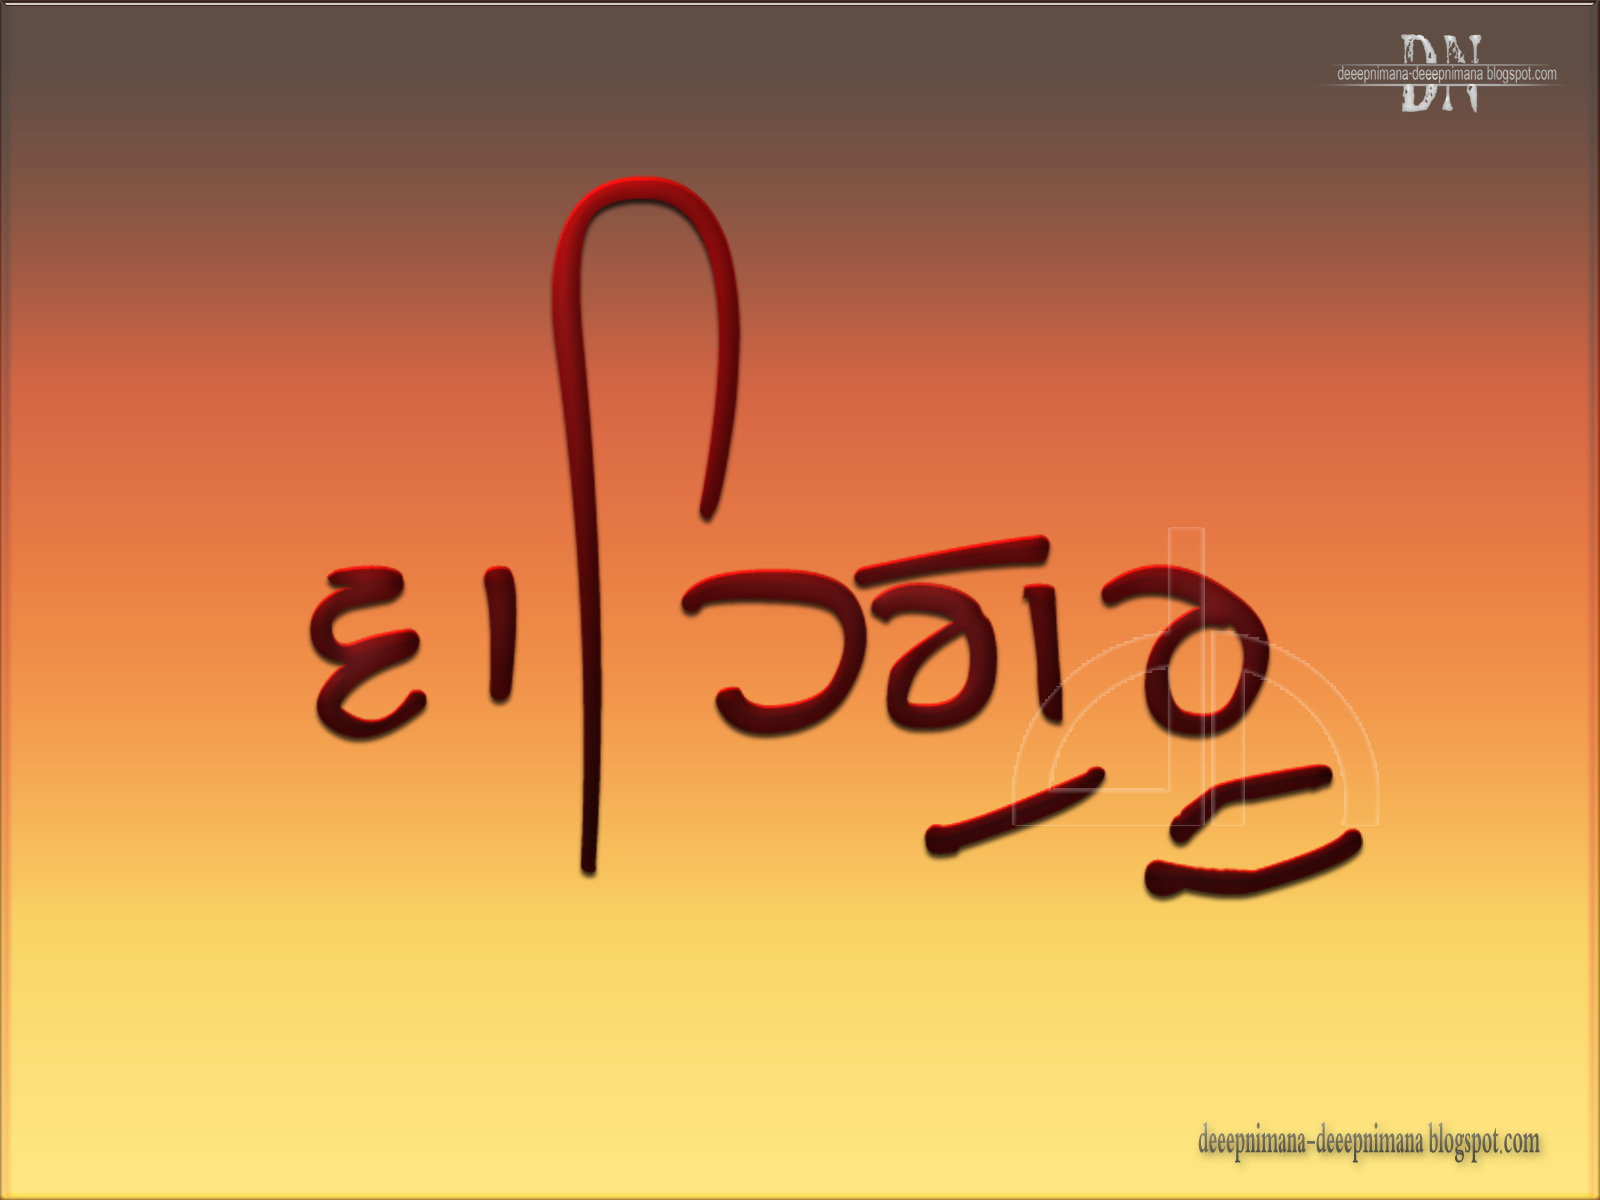 Gurbani Quotes Wallpaper Deeepnimana Deeepnimana Blogspot Com Waheguru Naam Simran